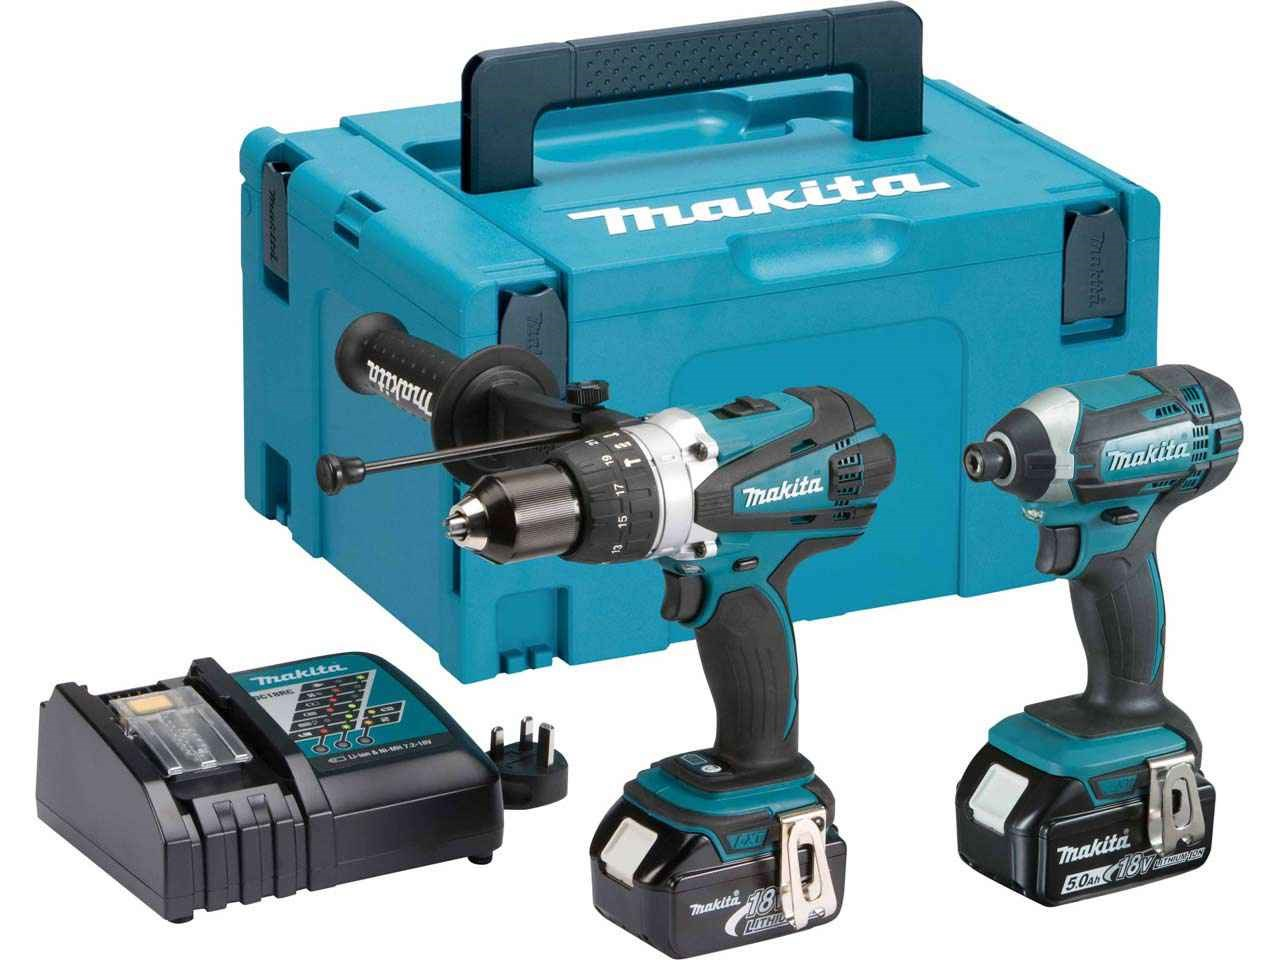 Makita DLX2145TJ 18V Brushed LXT DHP458 Combi Drill & DTD152 Impact Driver - 5.0Ah Pack